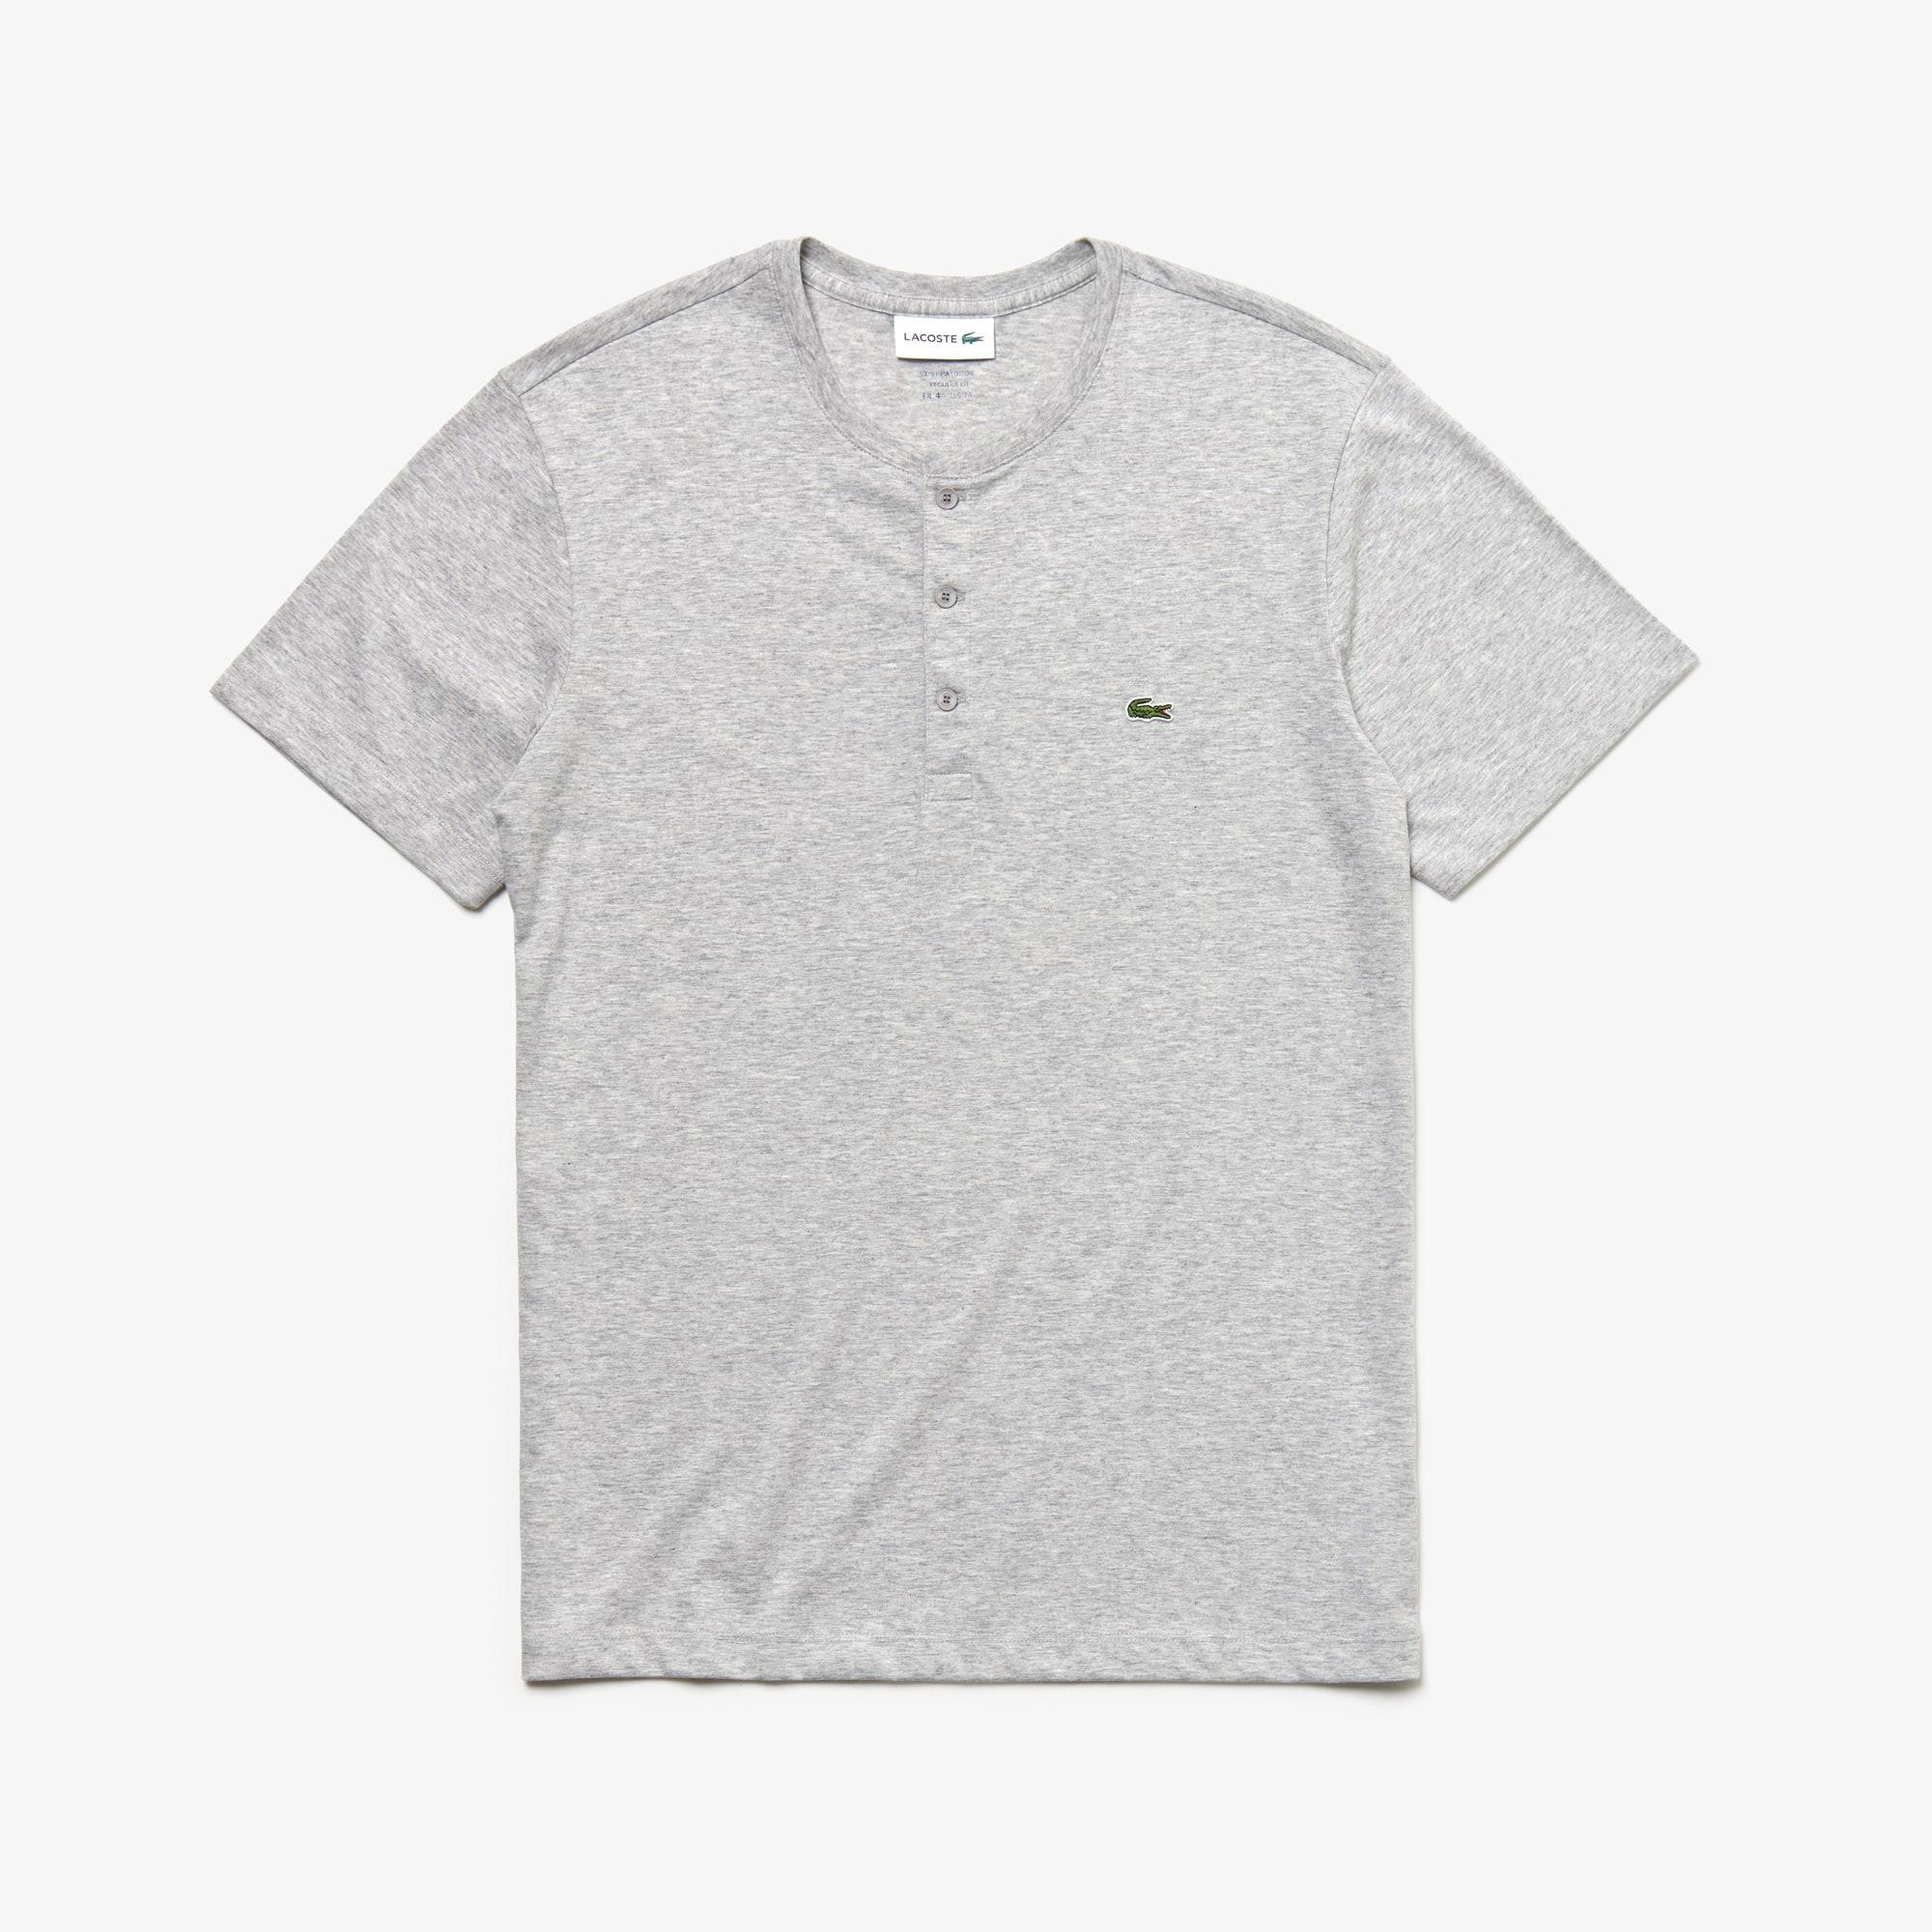 Camiseta De Cuello Henley De Punto Liso De Algodón Pima Liso